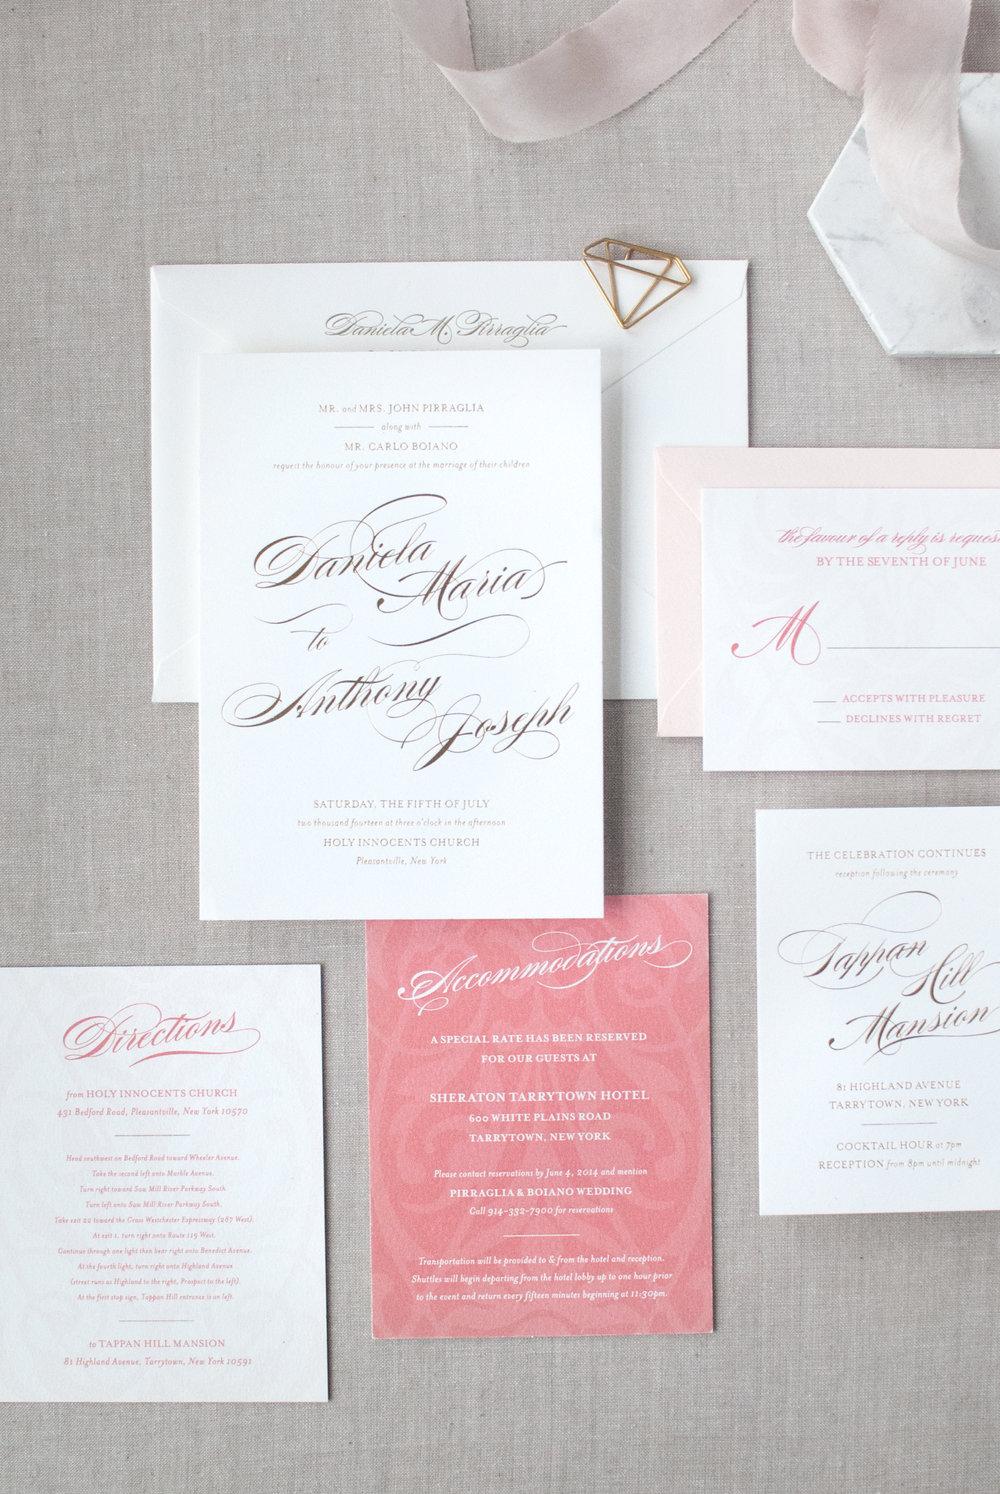 hj-wedding-invitations-daniela-anthony-5.jpg